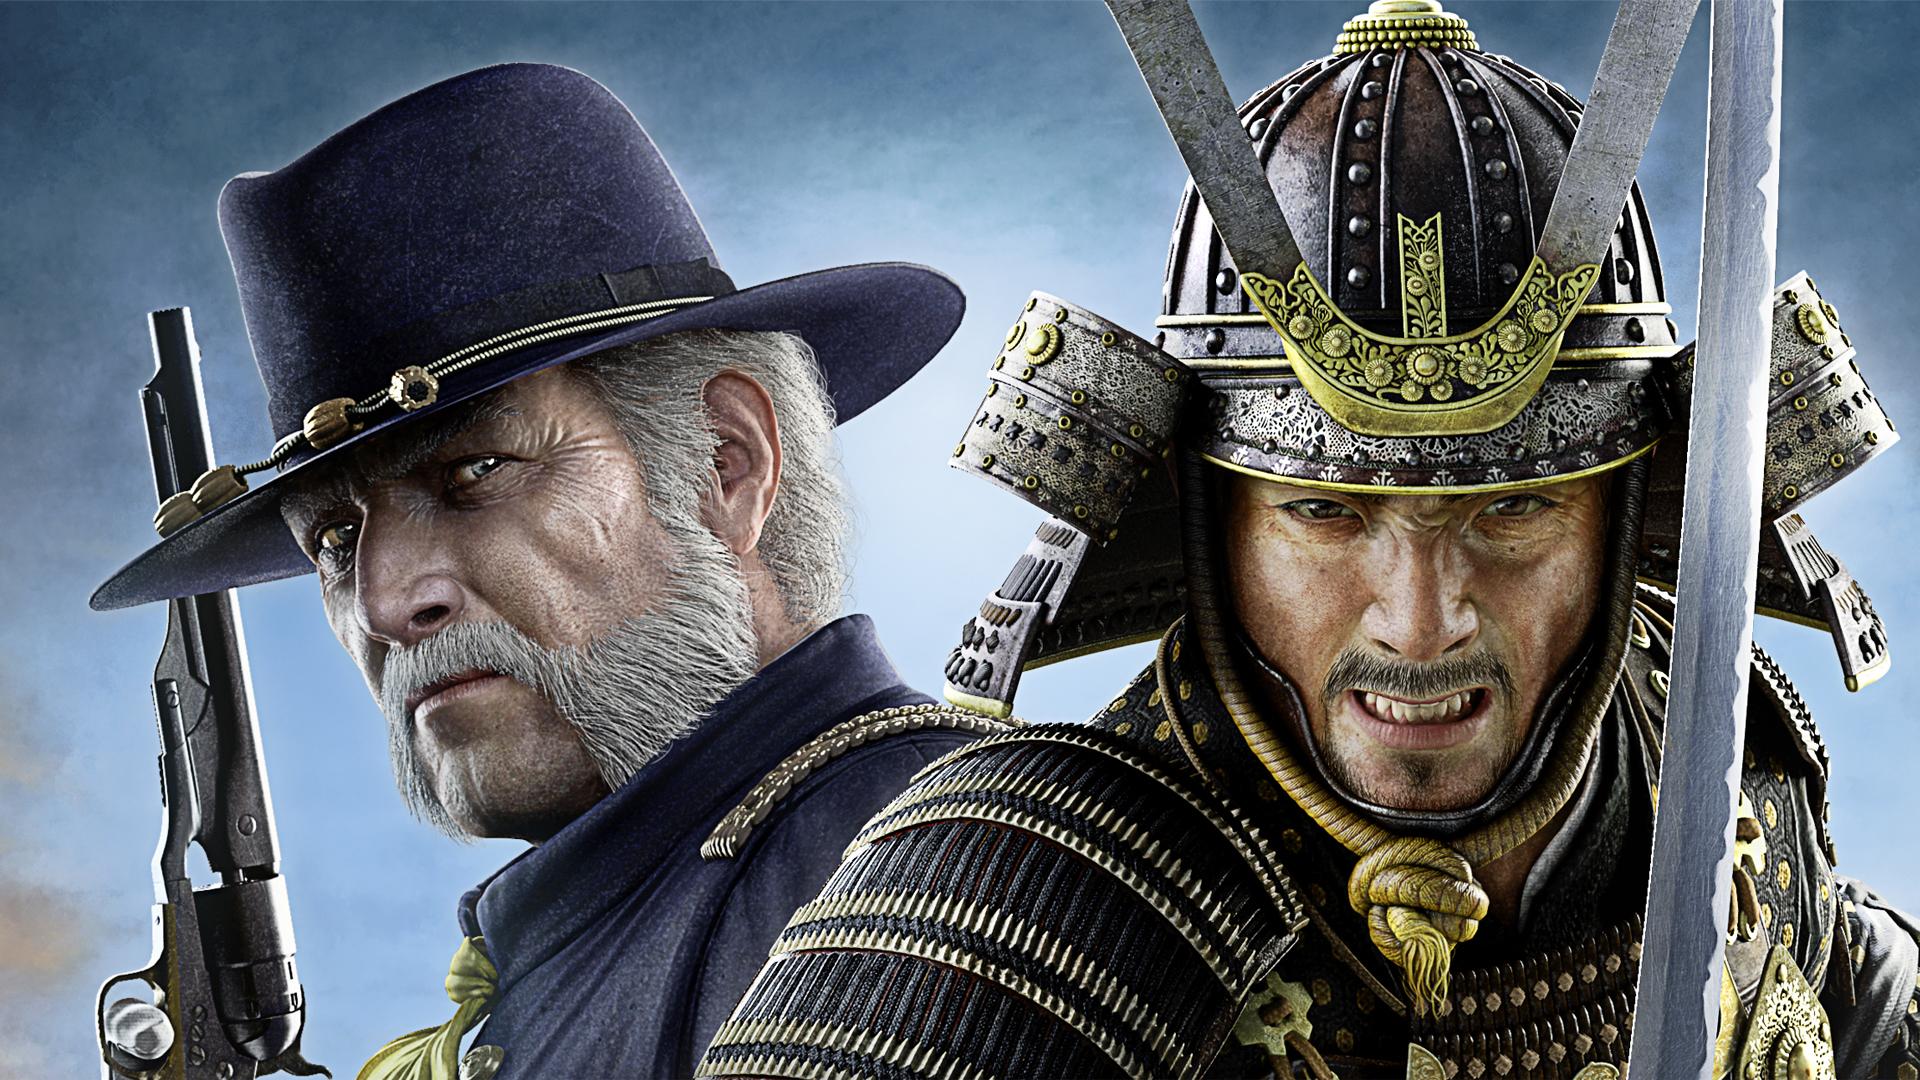 Total War Shogun 2 Fall Of The Samurai Wallpaper Hd Total War Shogun 2 Hd Wallpaper Background Image